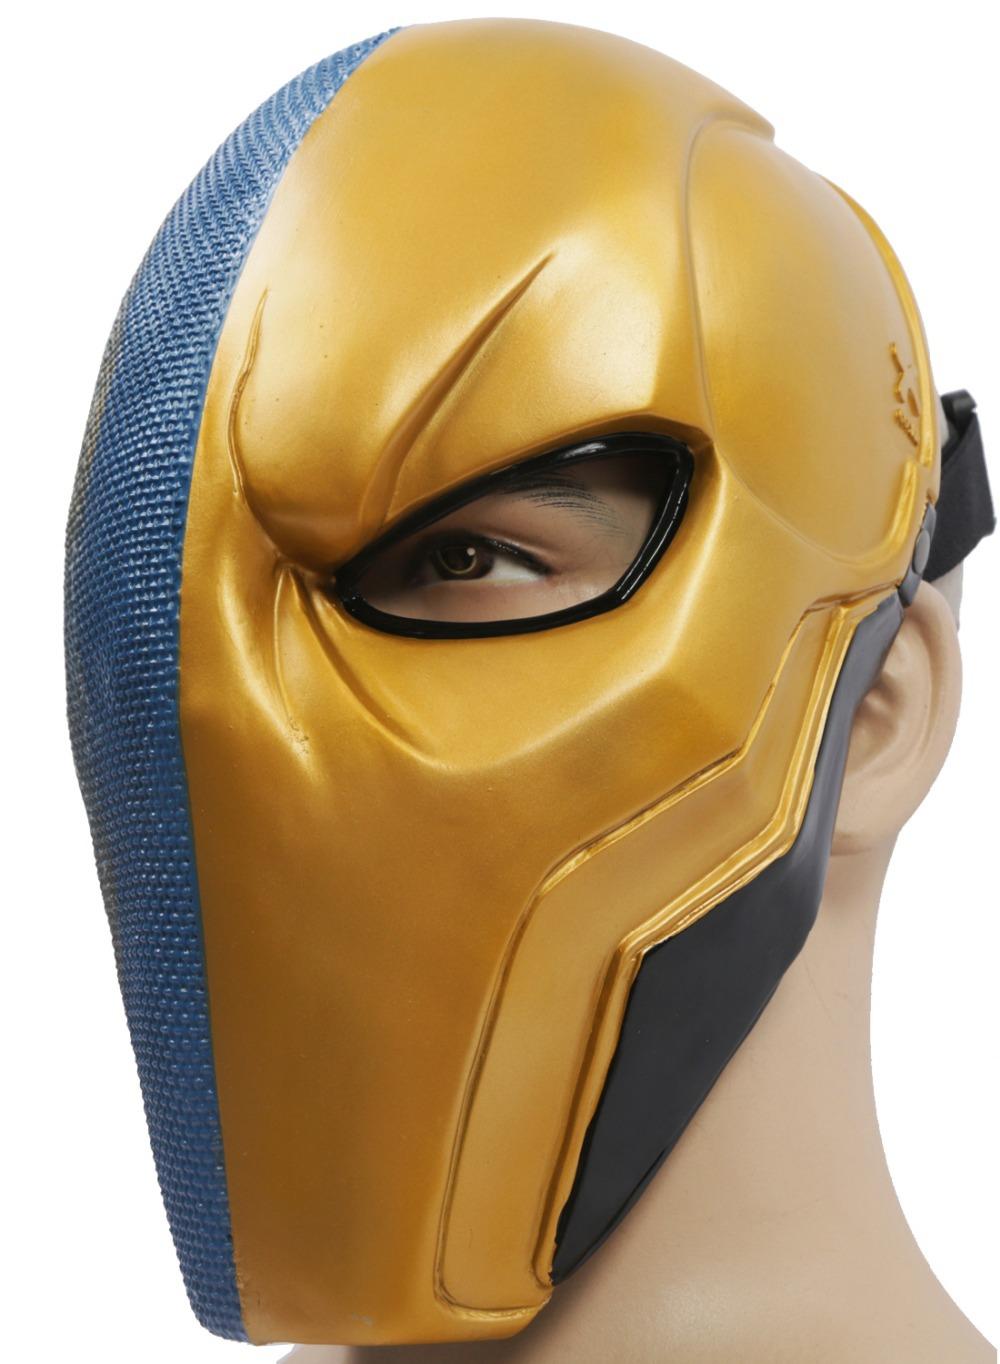 Batman Arkham Origins Deathstroke Mask Batman:arkham Origins